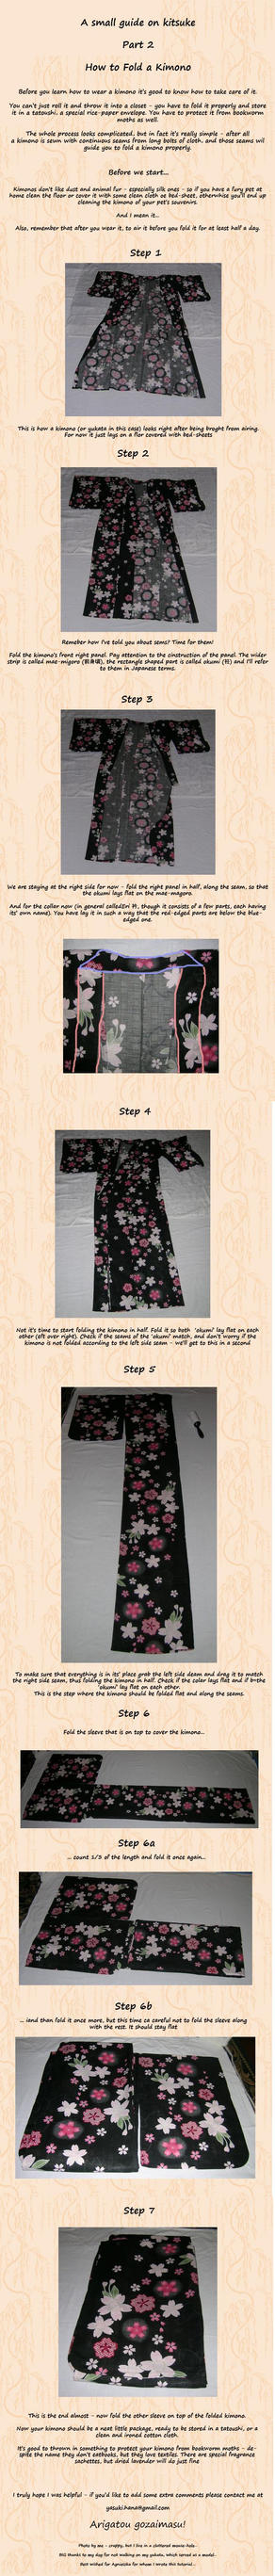 Kimono Folding Tutorial by Arleen